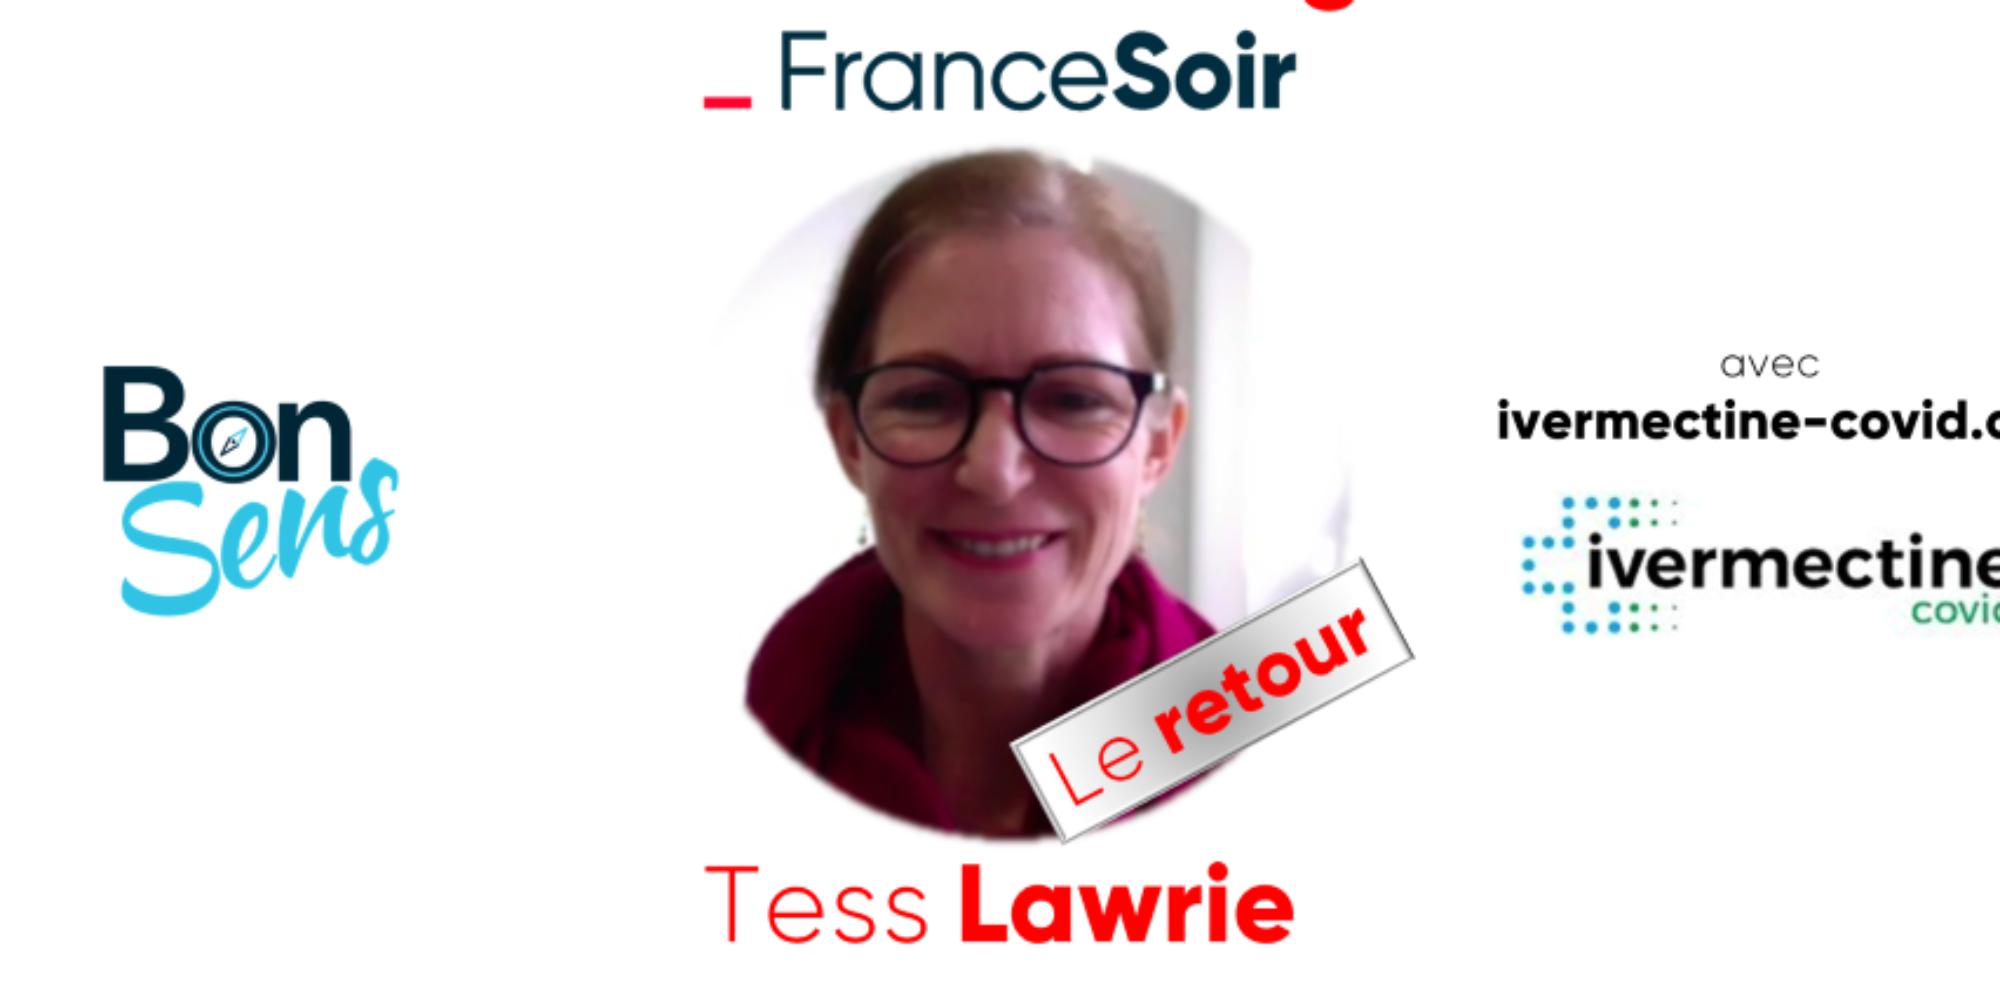 Tess Lawrie